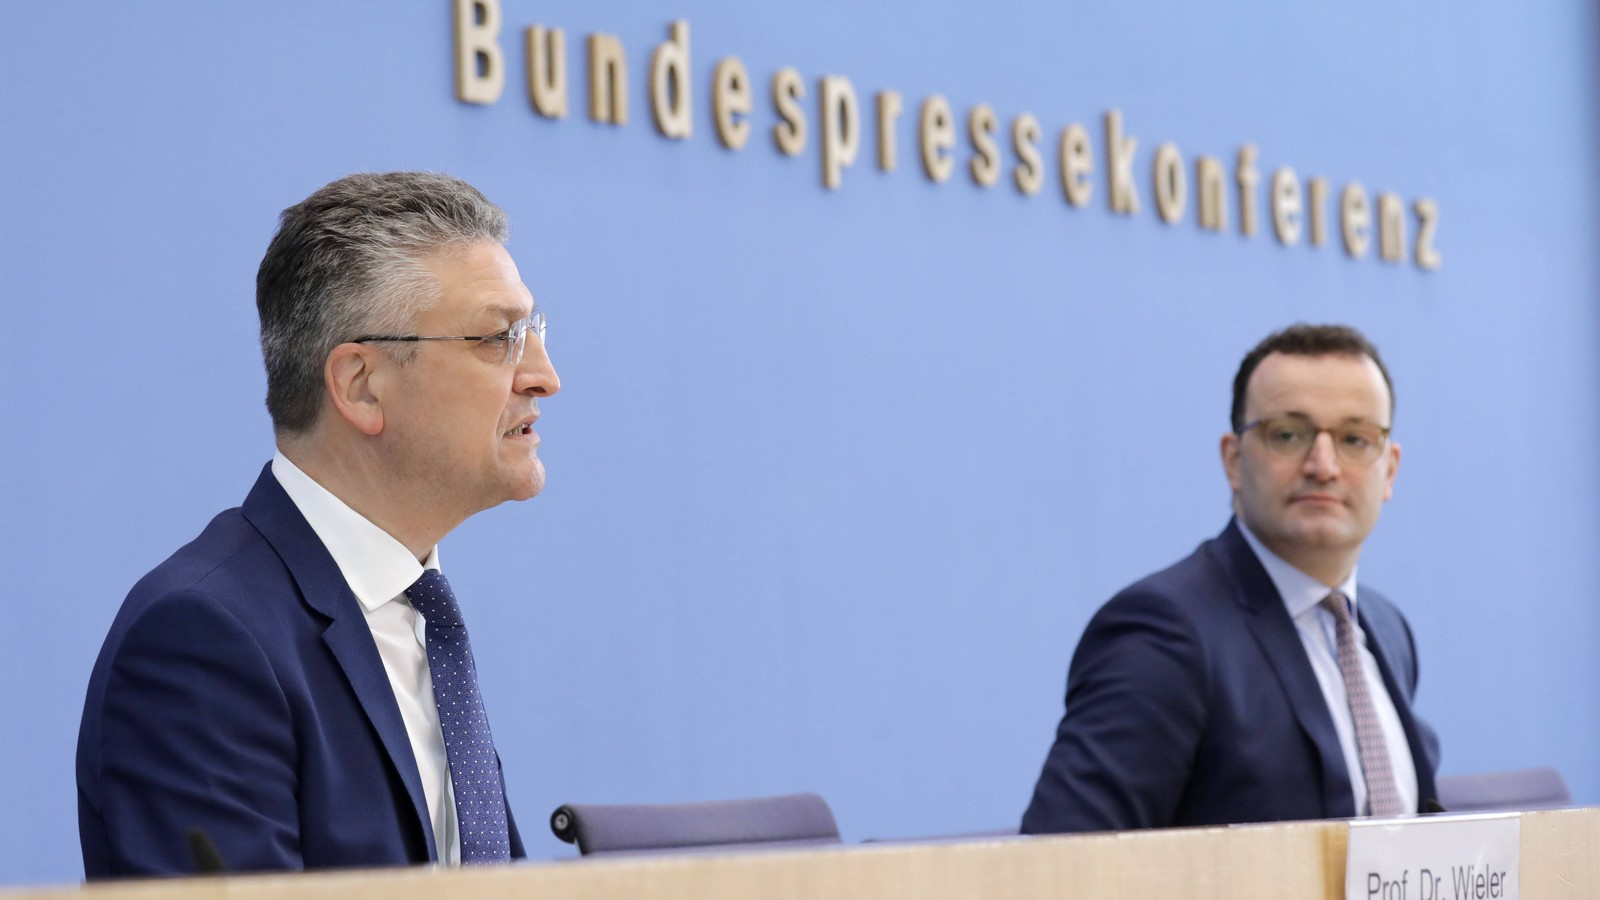 Prof. Lothar H. Wieler, Praesident Robert-Koch-Institut (RKI), Jens Spahn, Bundesminister fuer Gesundheit